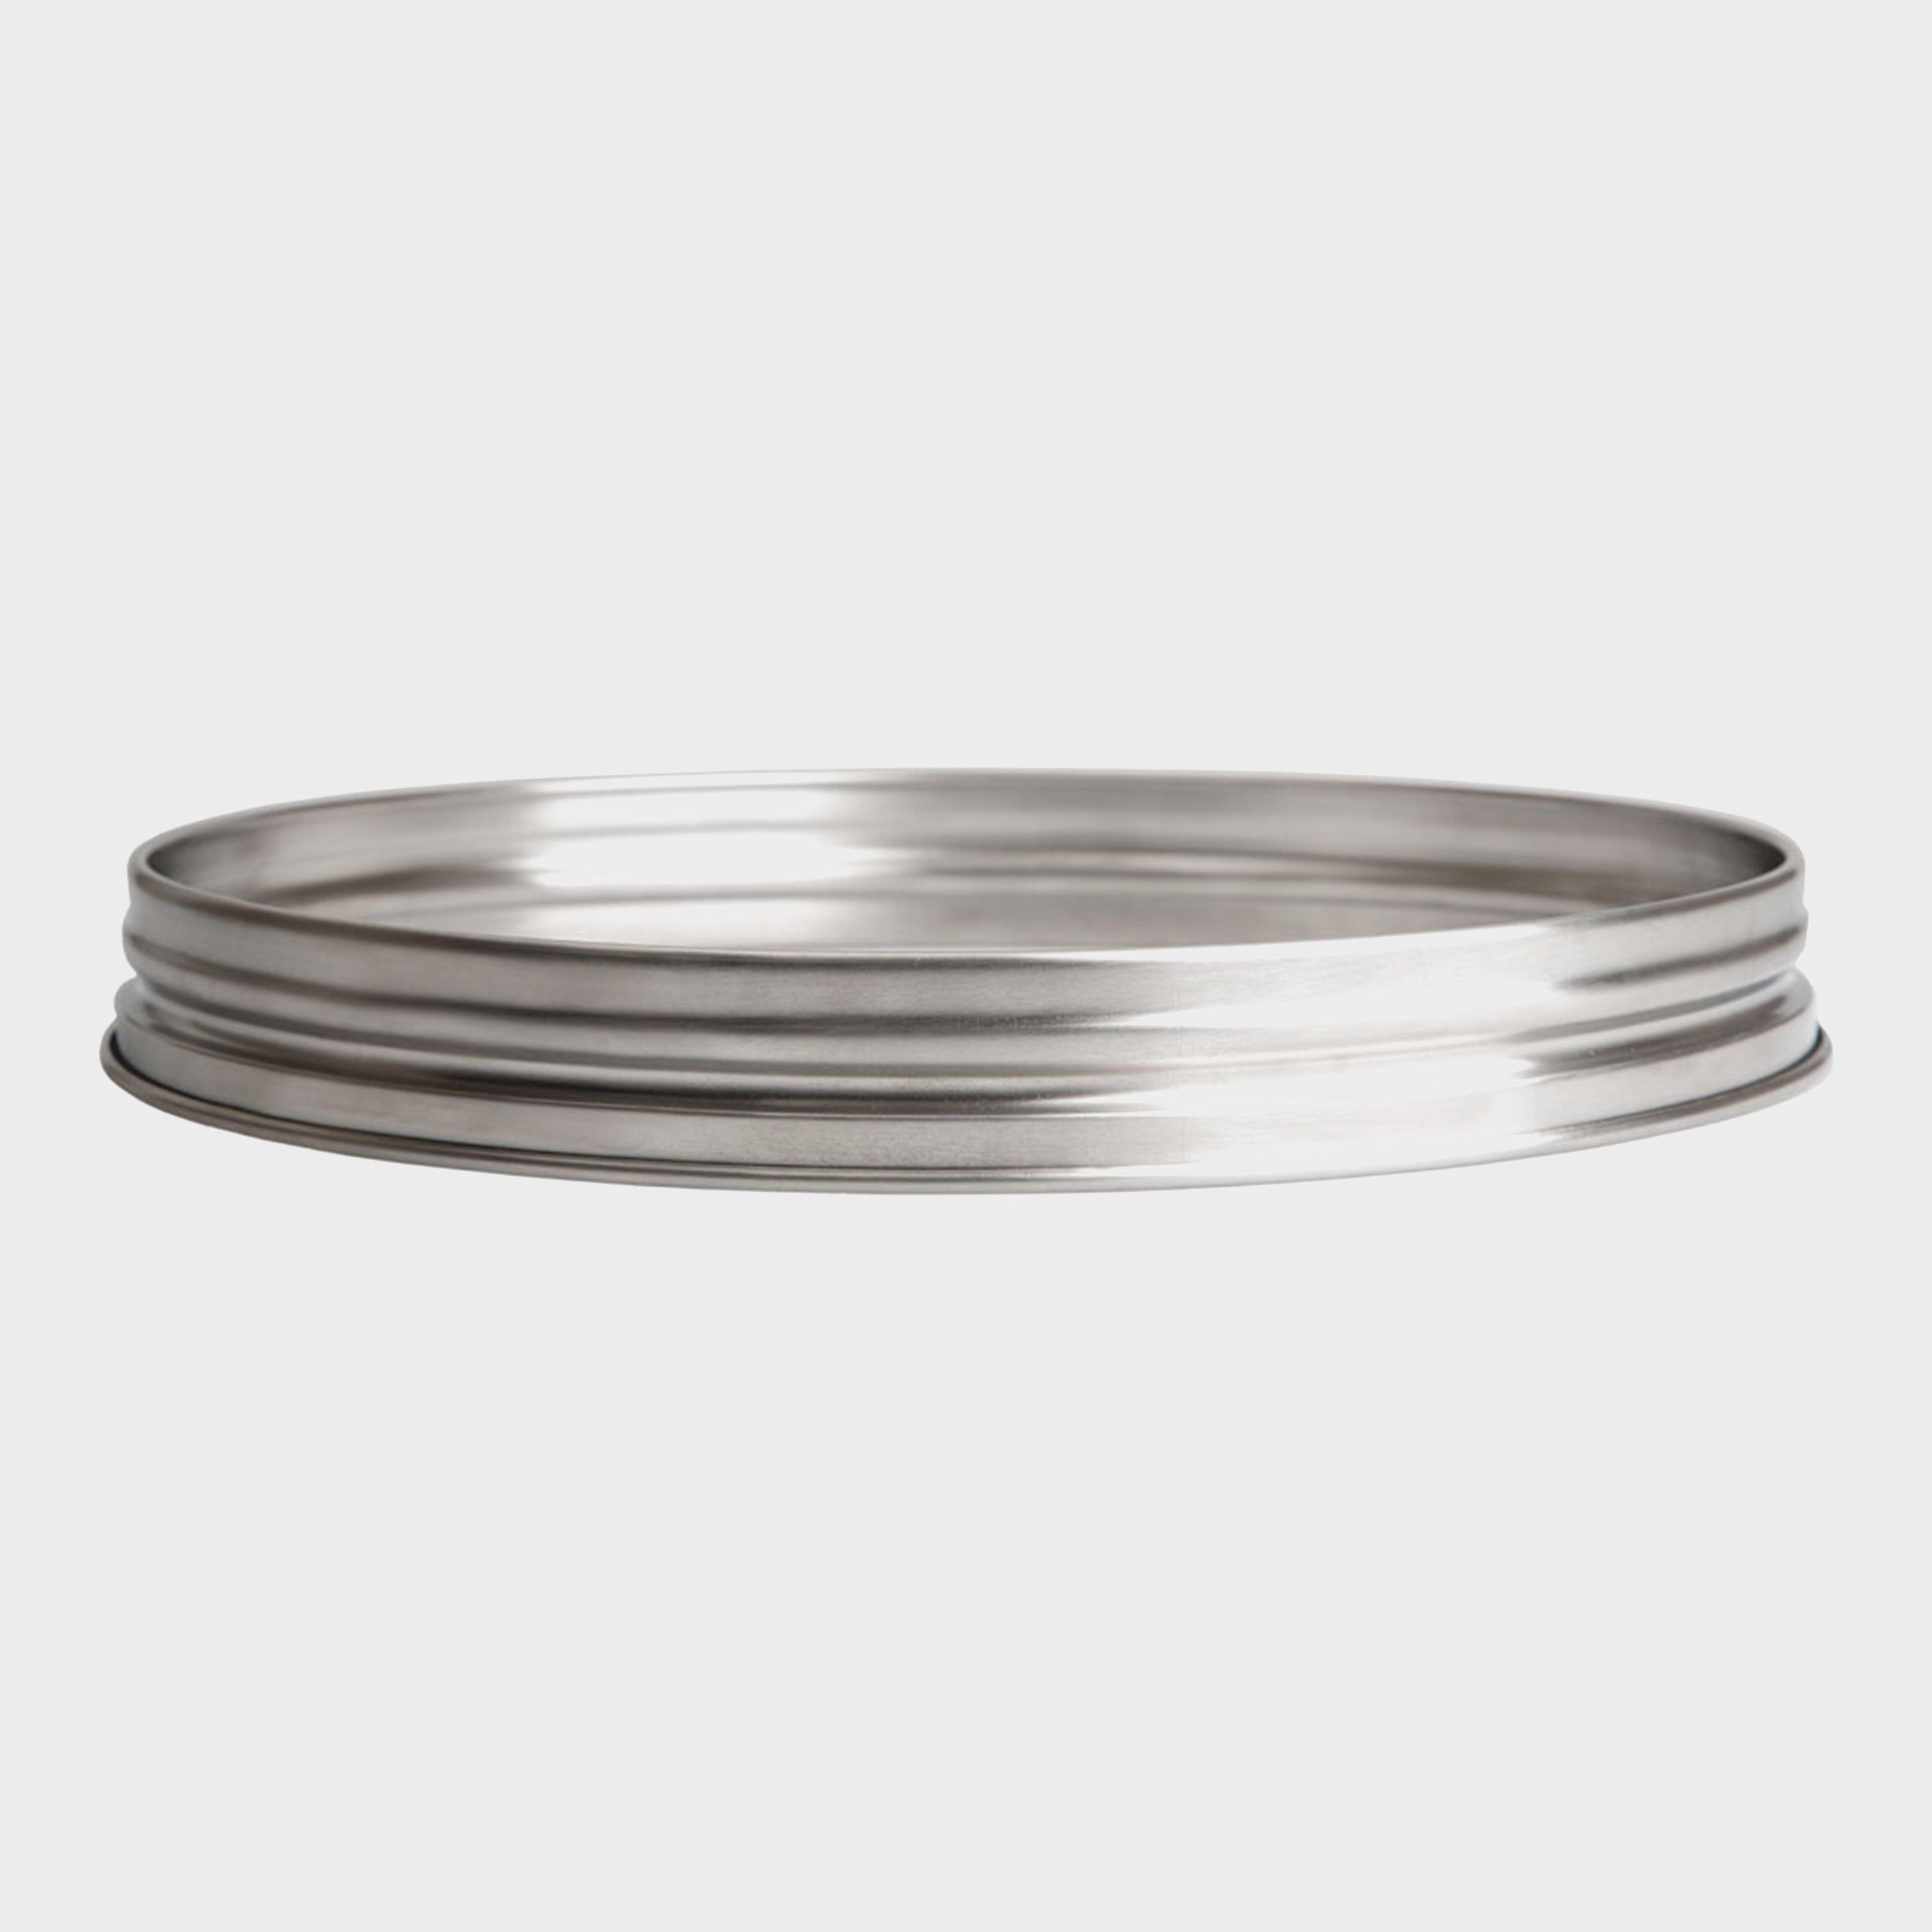 Cobb Cobb Compact Extension Ring